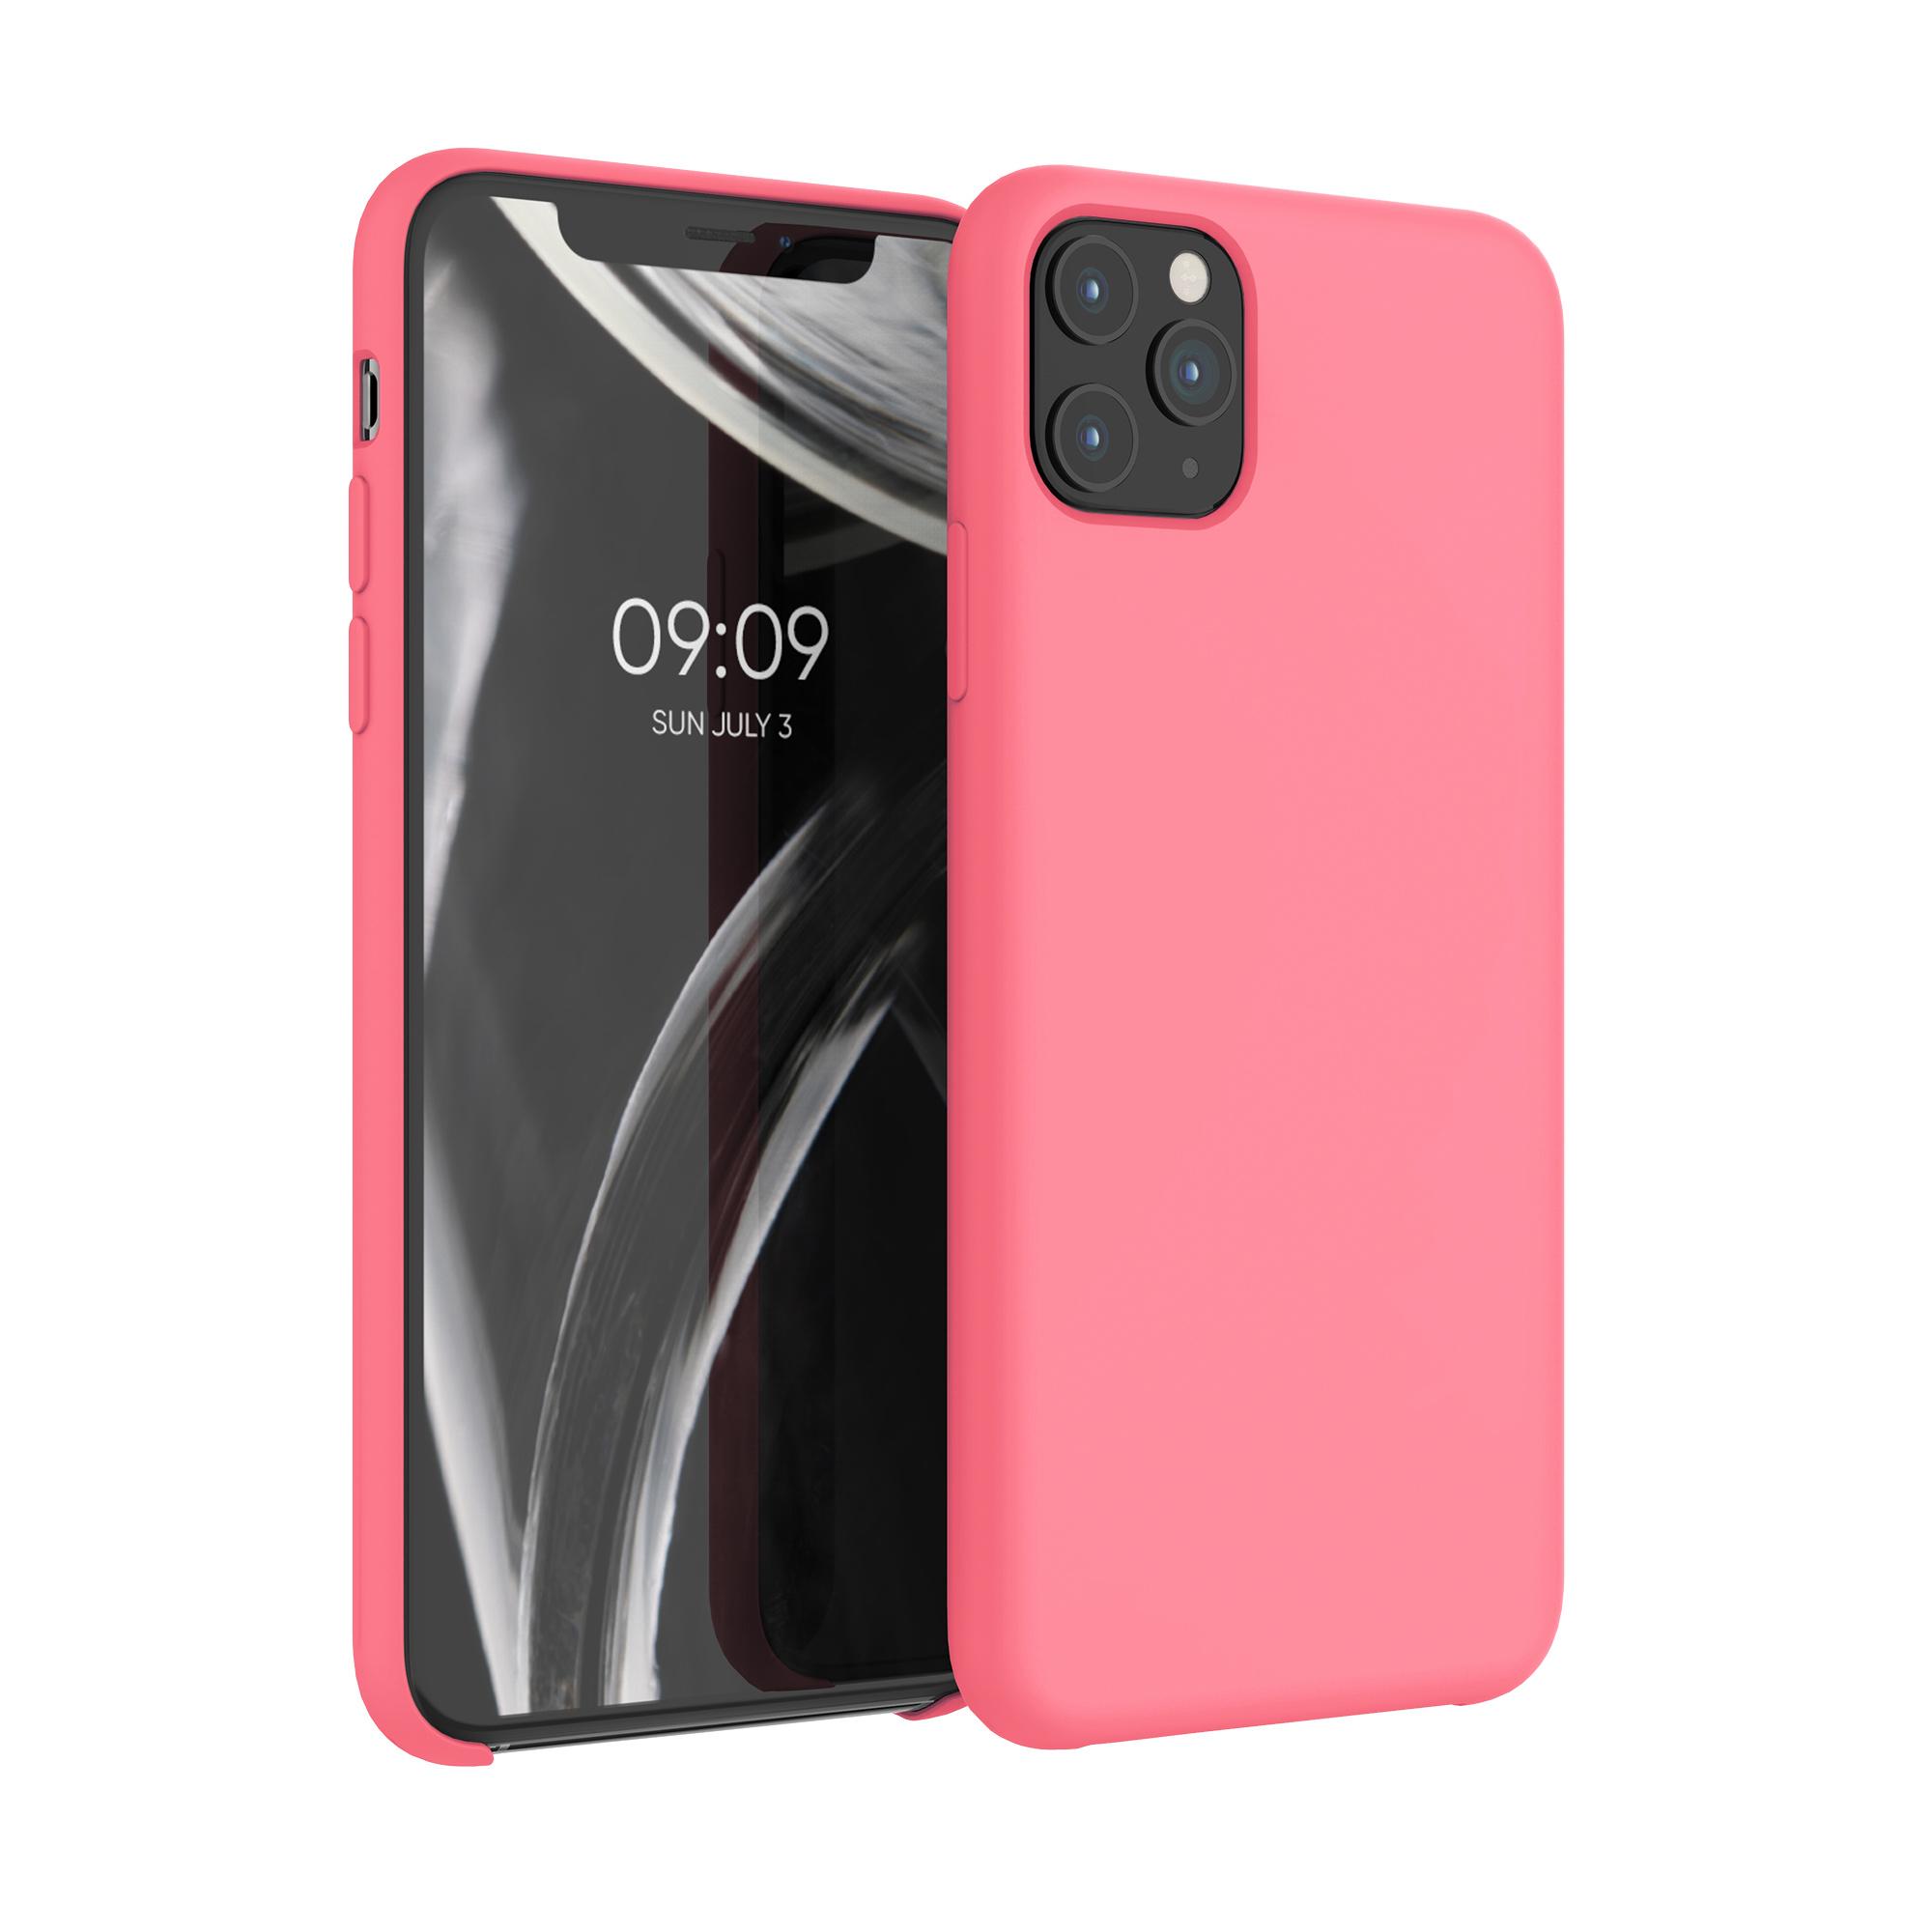 Kvalitní silikonové TPU pouzdro pro Apple iPhone 11 Pro Max - Neon Coral